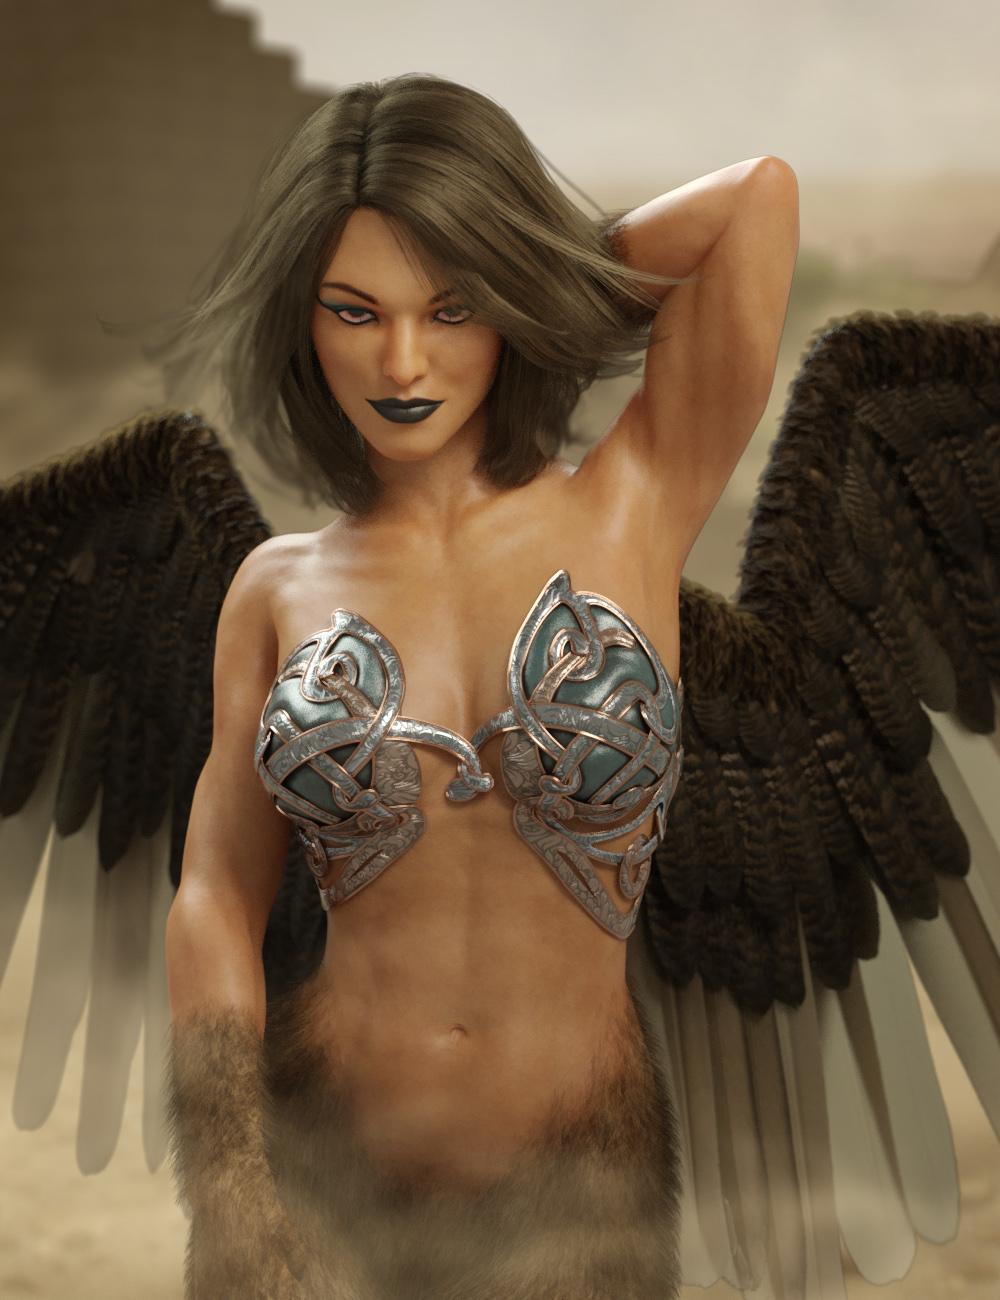 Sphinx for Genesis 8 Female by: RawArt, 3D Models by Daz 3D